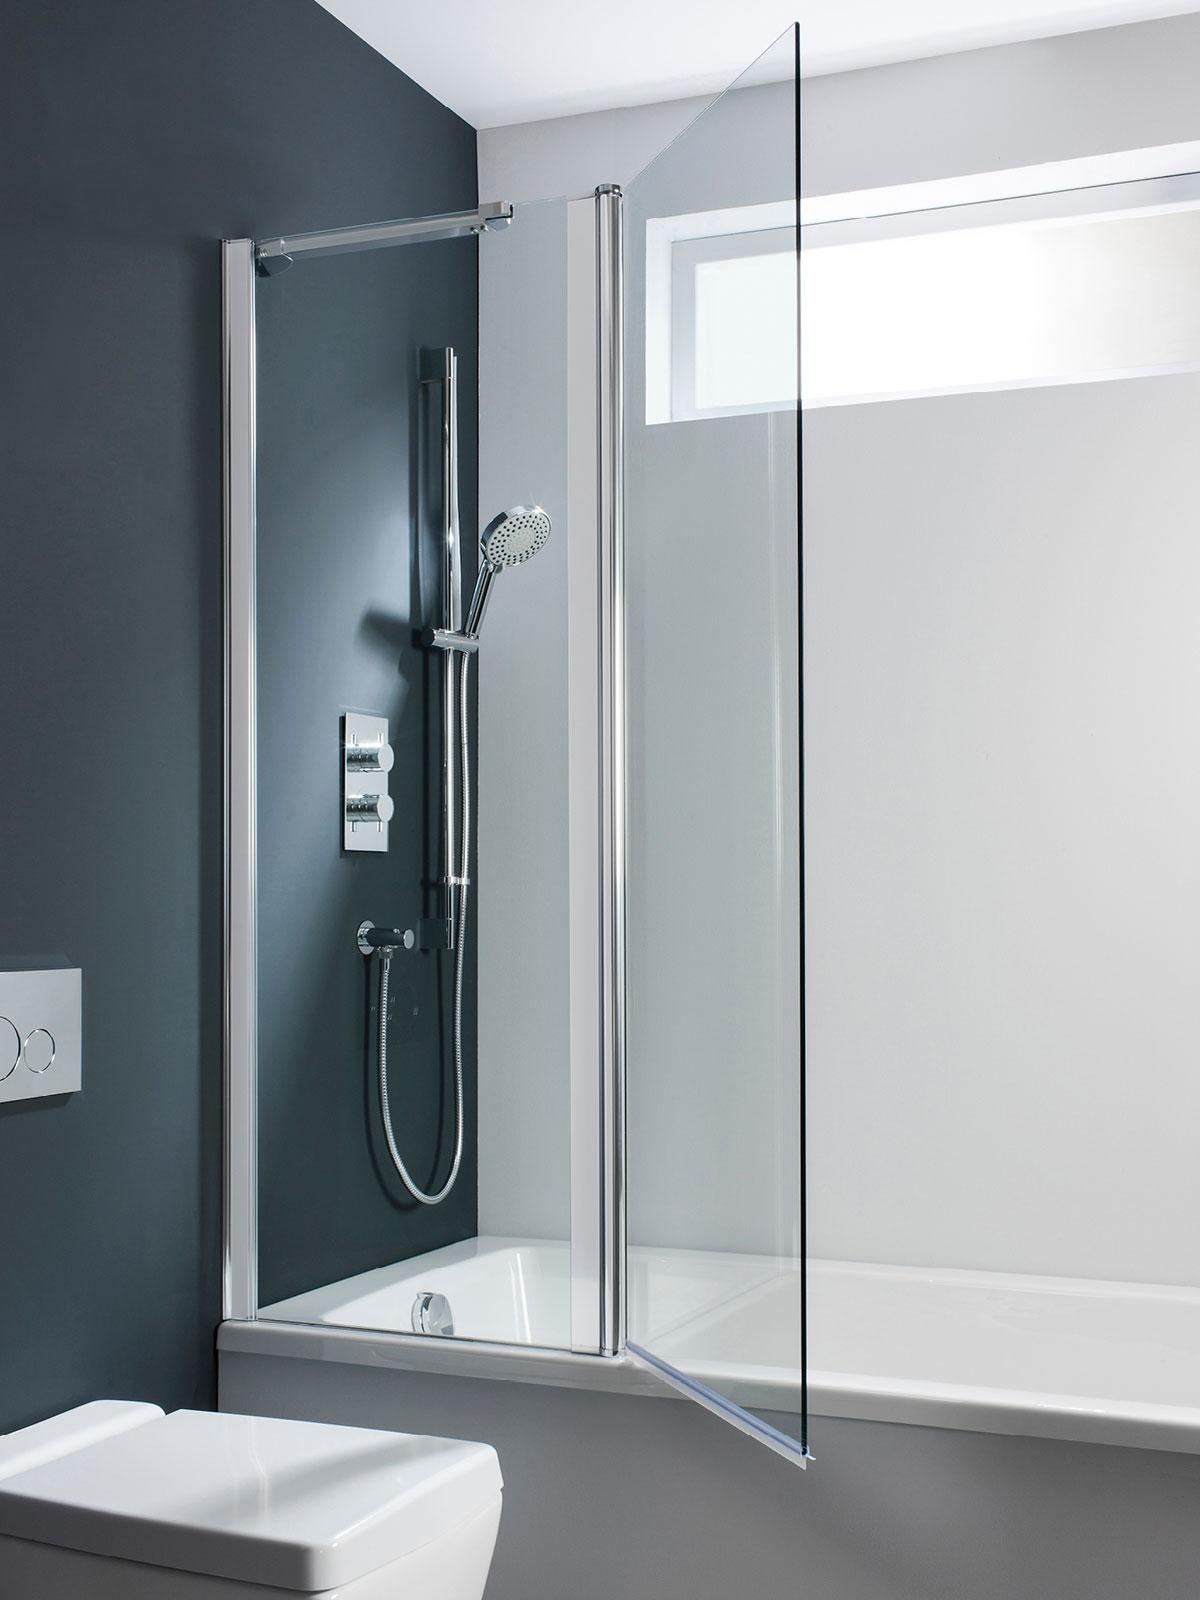 Design Double Bath Screen Outward Opening In Design